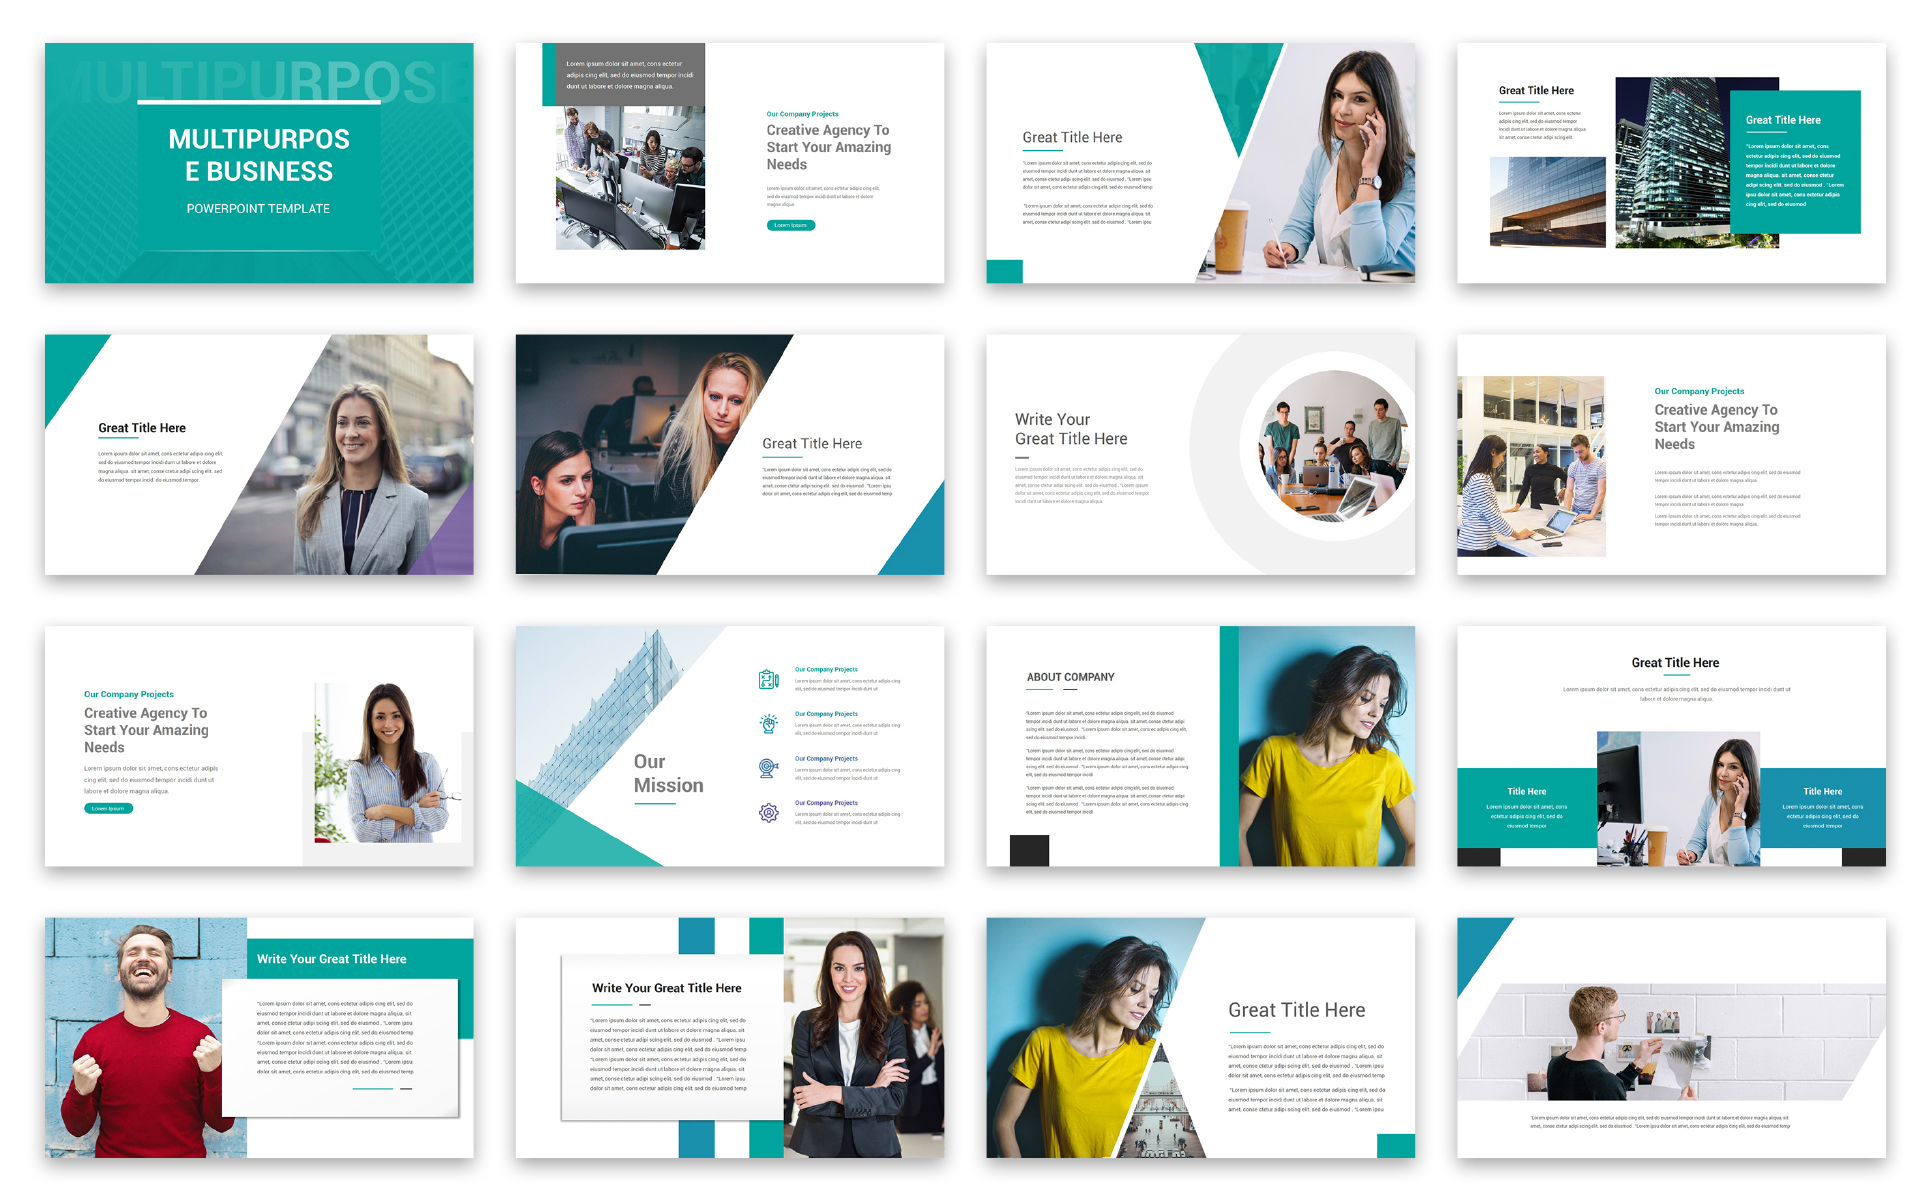 Multipurpose Business PowerPoint Template - screenshot